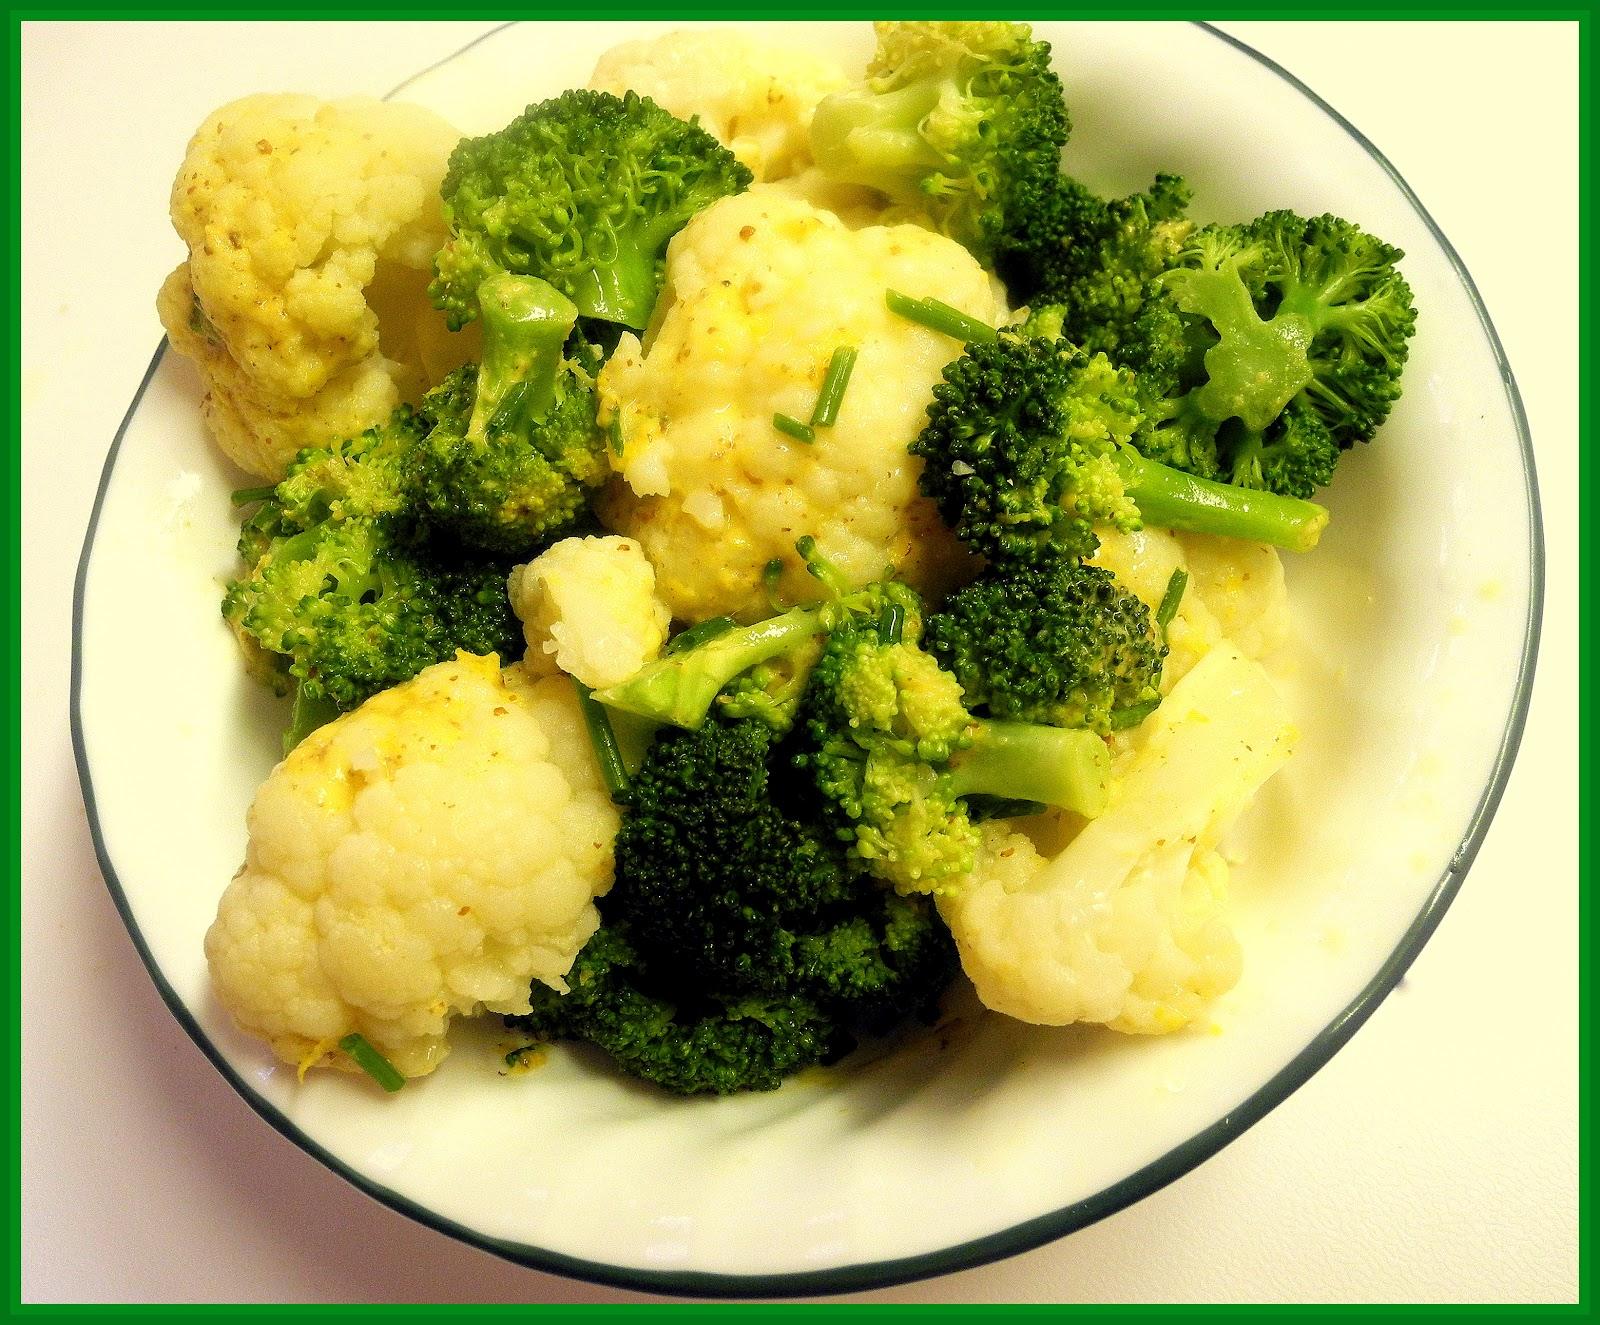 Lemon-Mustard Broccoli and Cauliflower